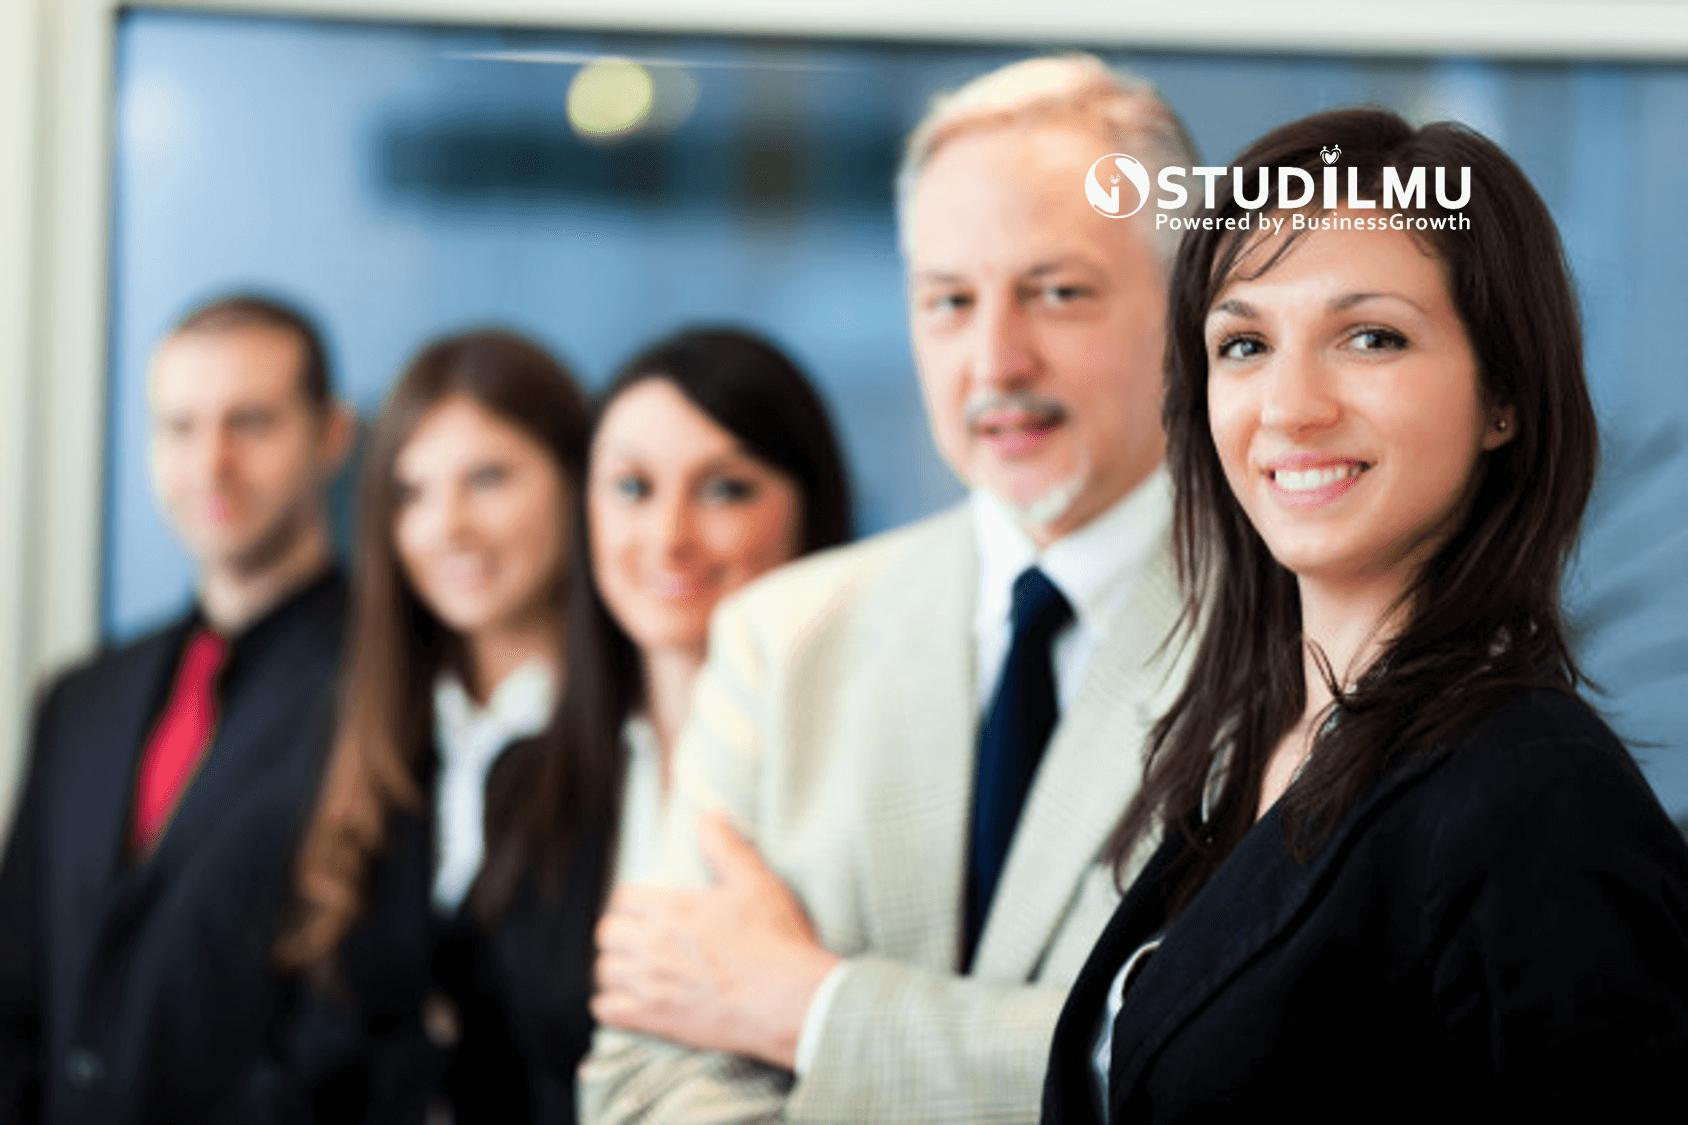 STUDILMU Career Advice - 12 Pengembangan Diri Menjadi Pemimpin dan Individu yang Lebih Baik